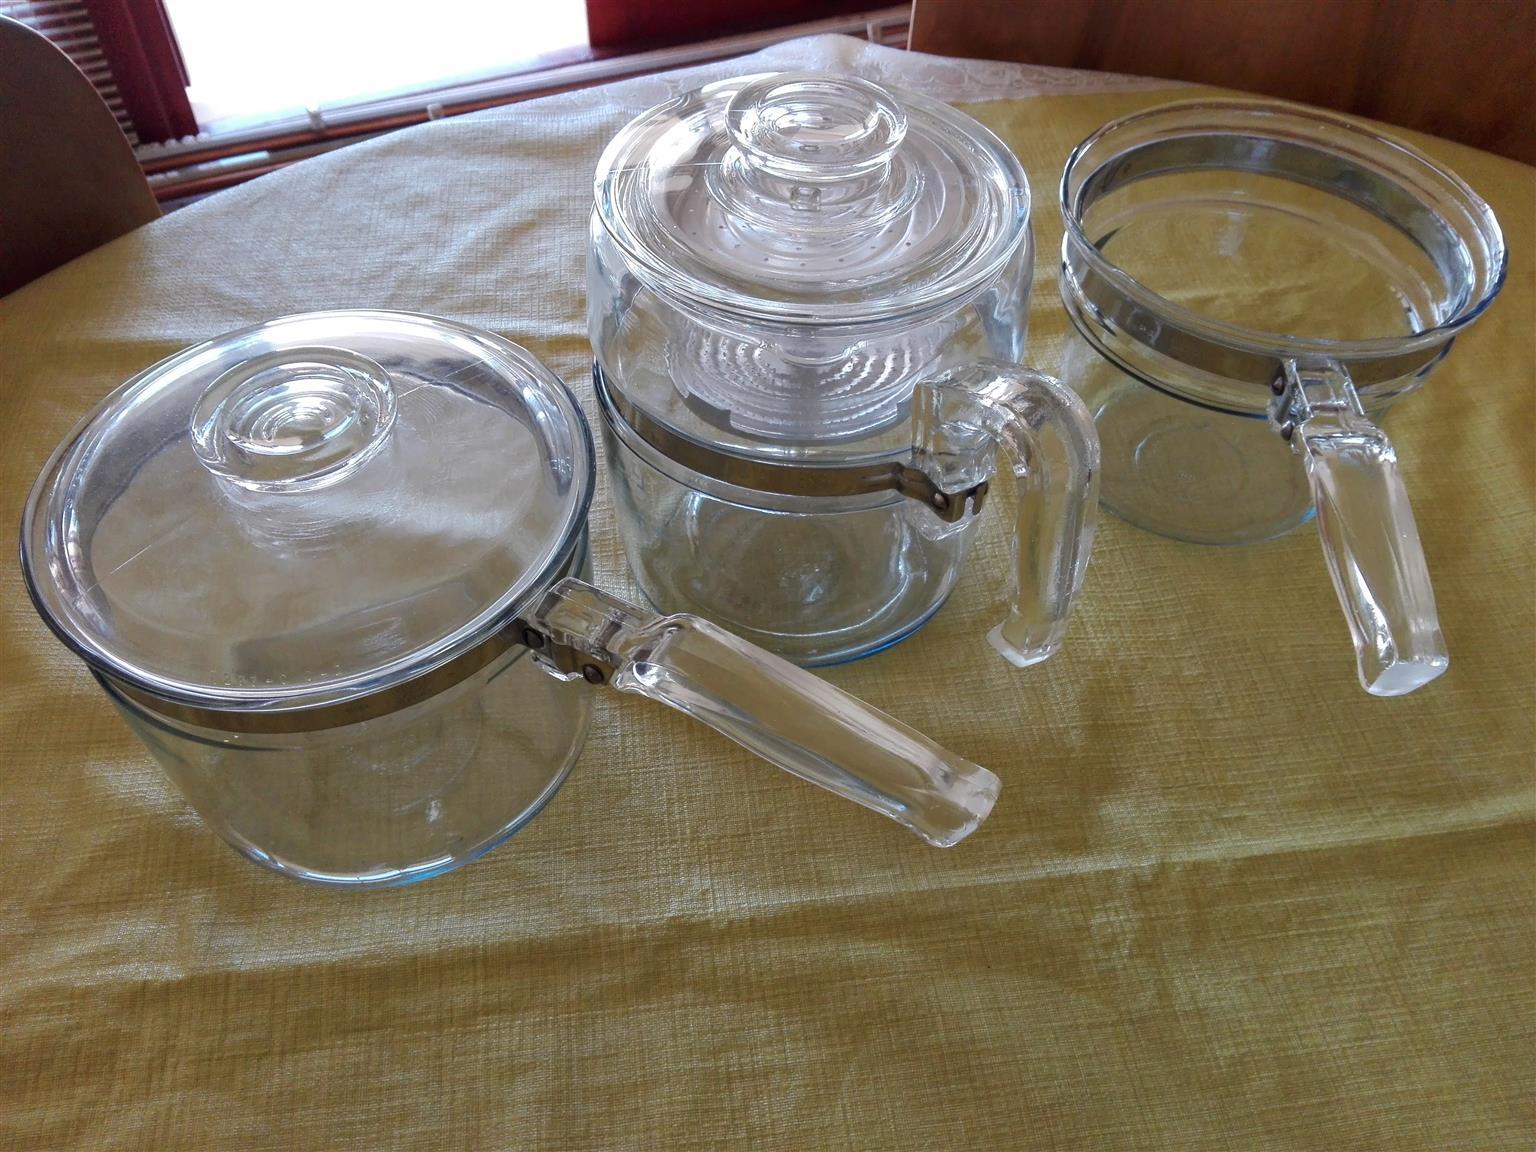 2 glass pots and 1 coffee percolator